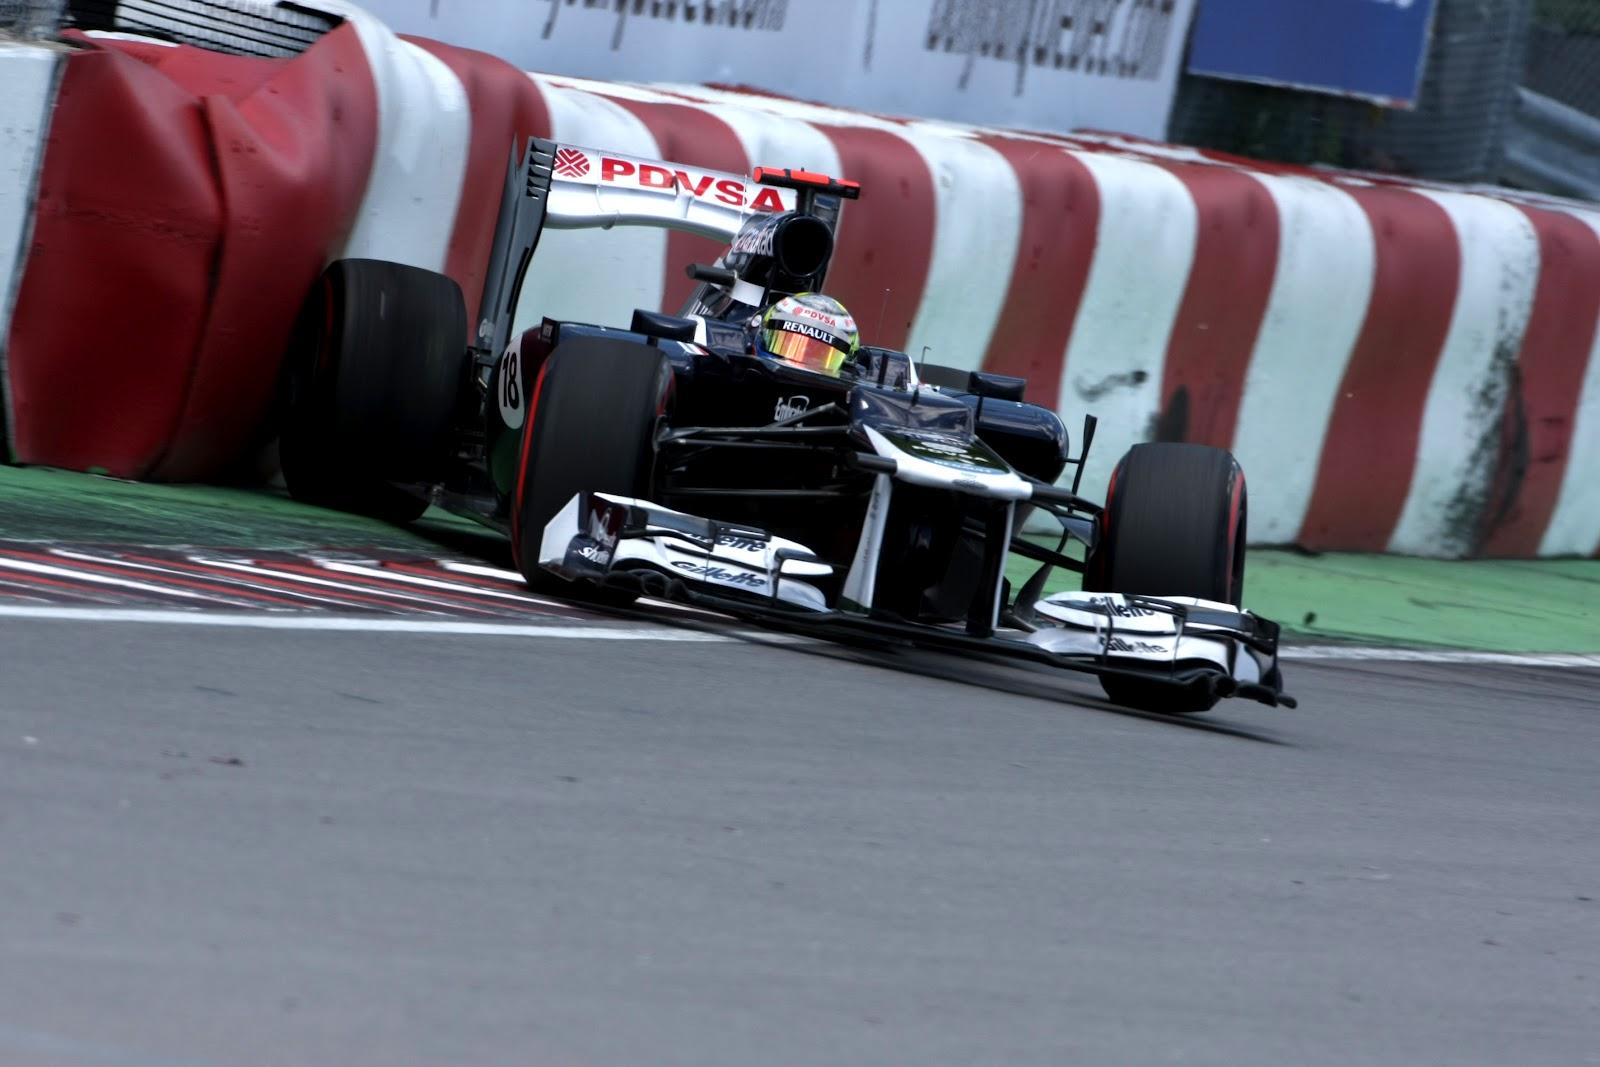 Montreal,+Canada,+Saturday+9+June+2012+-+Pastor+Maldonado+(VEN),+Williams+F1+Team.jpg